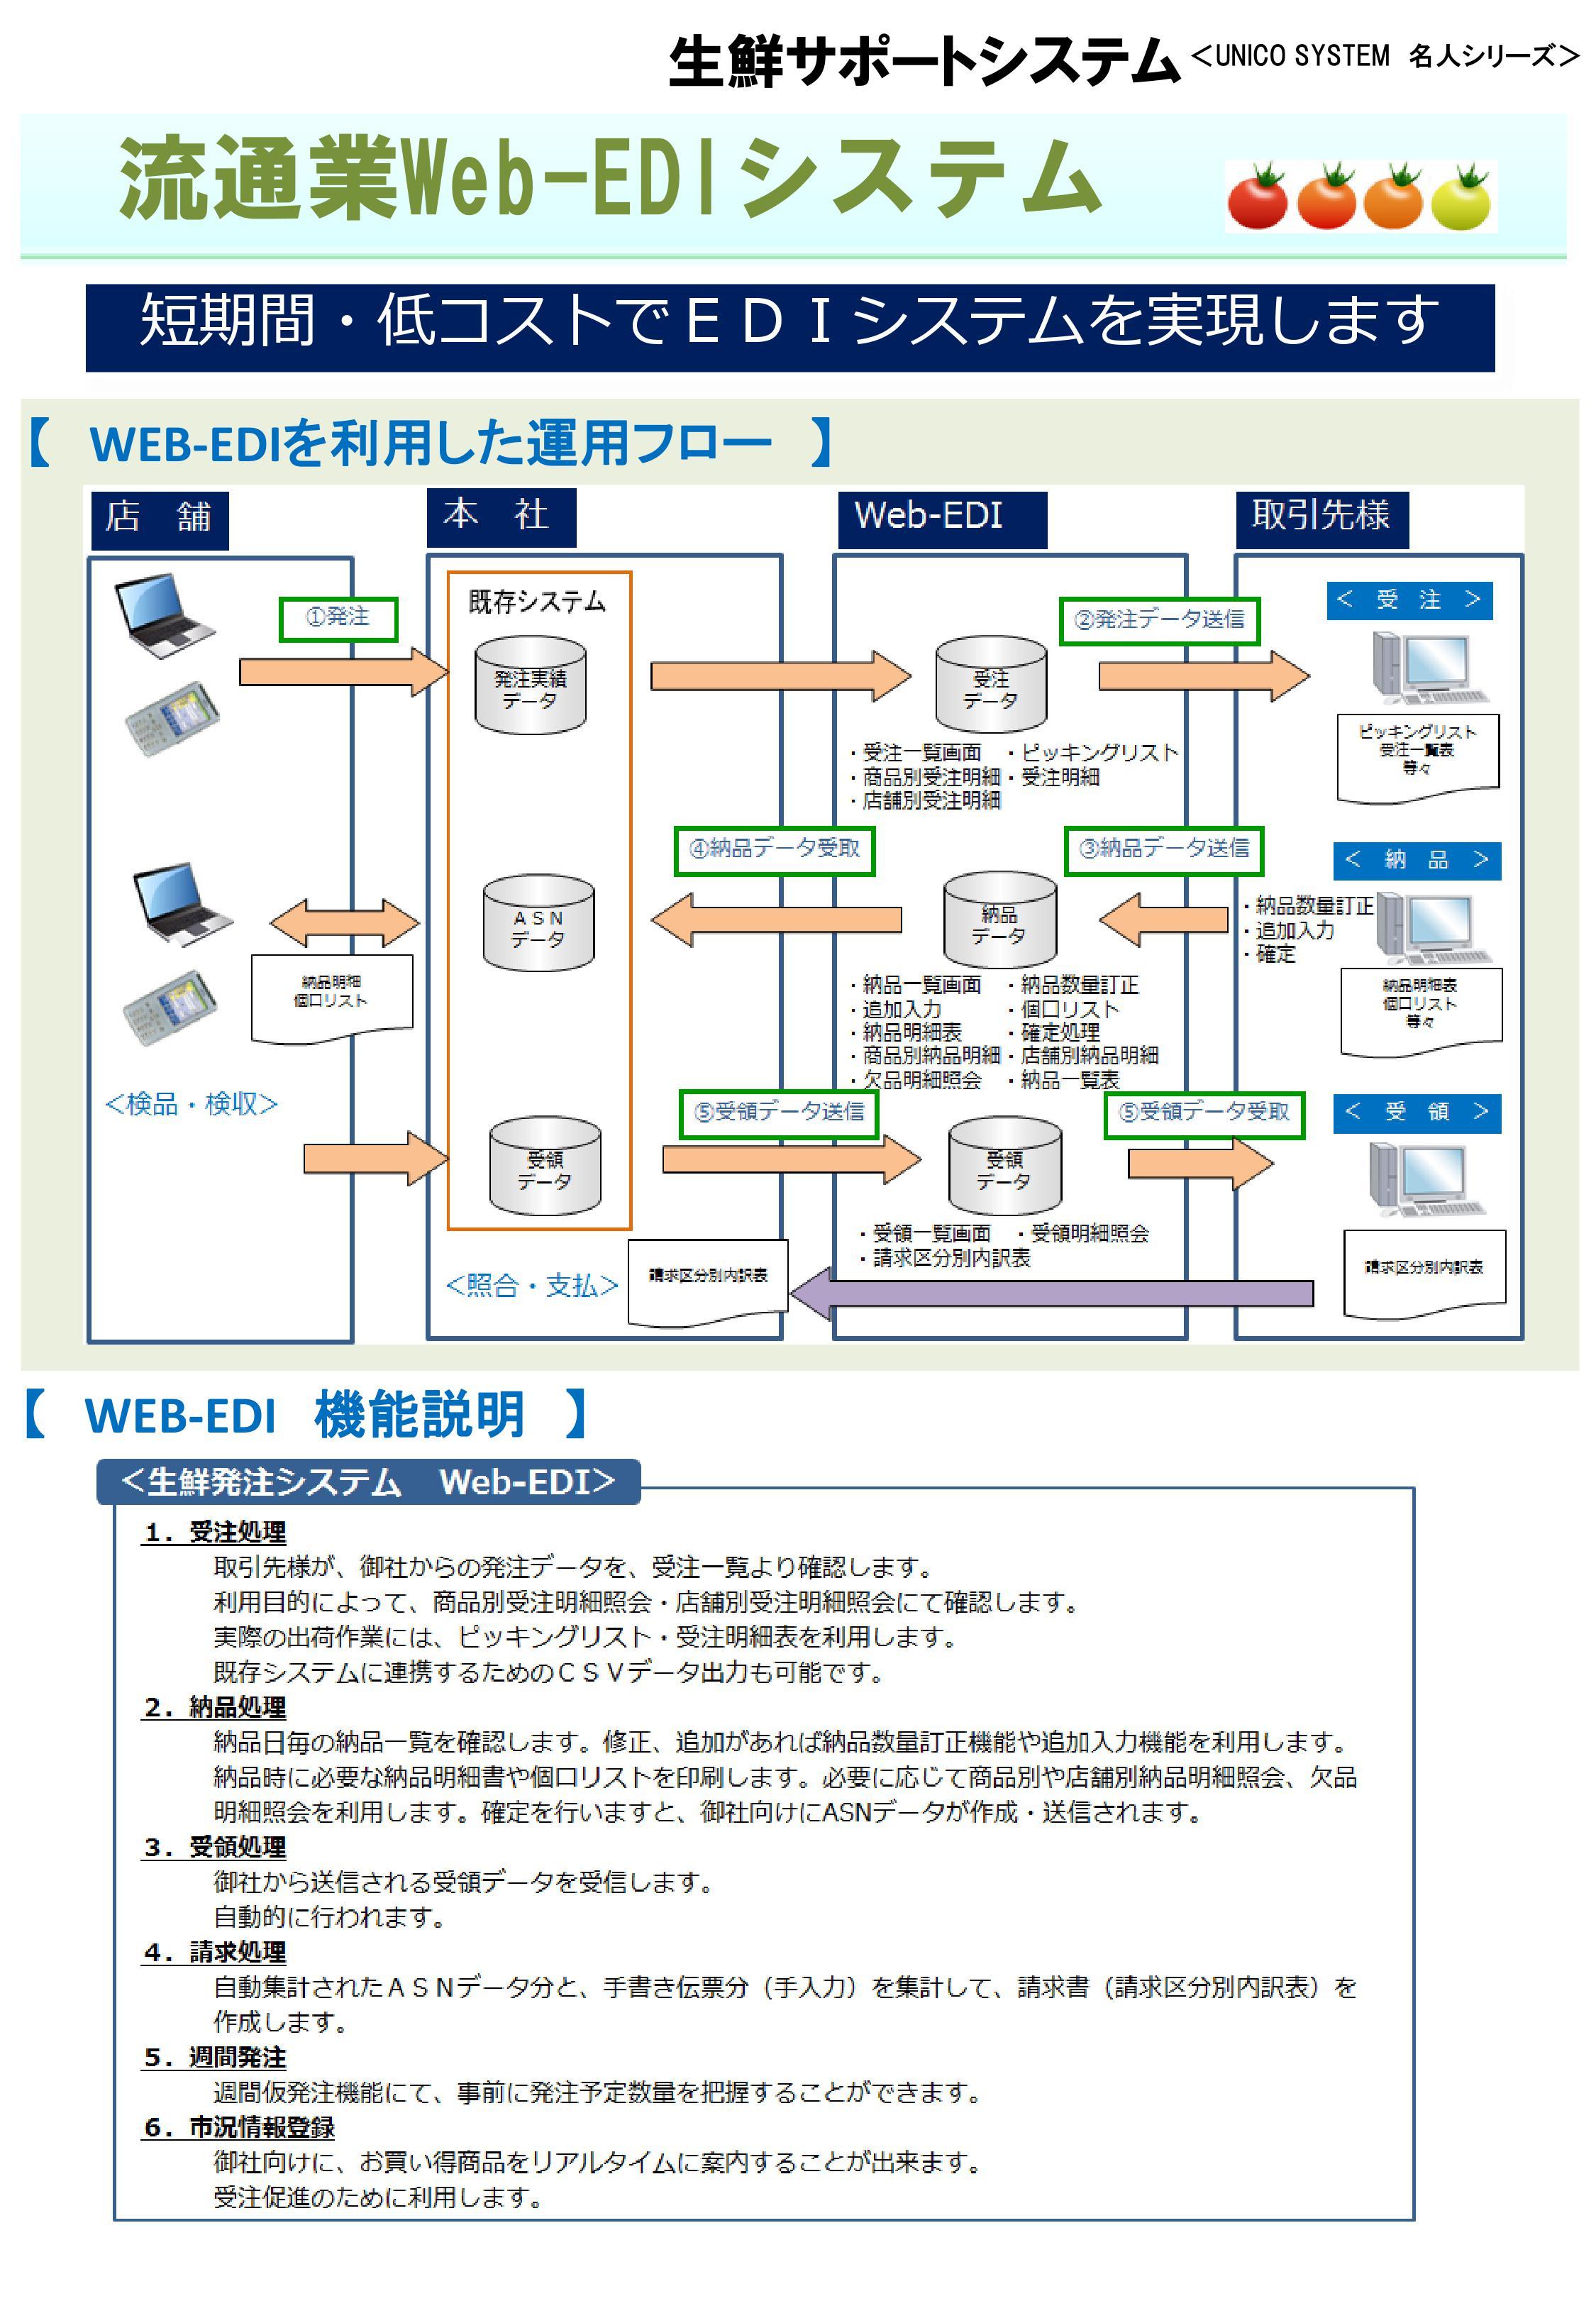 WEB-EDI 0001